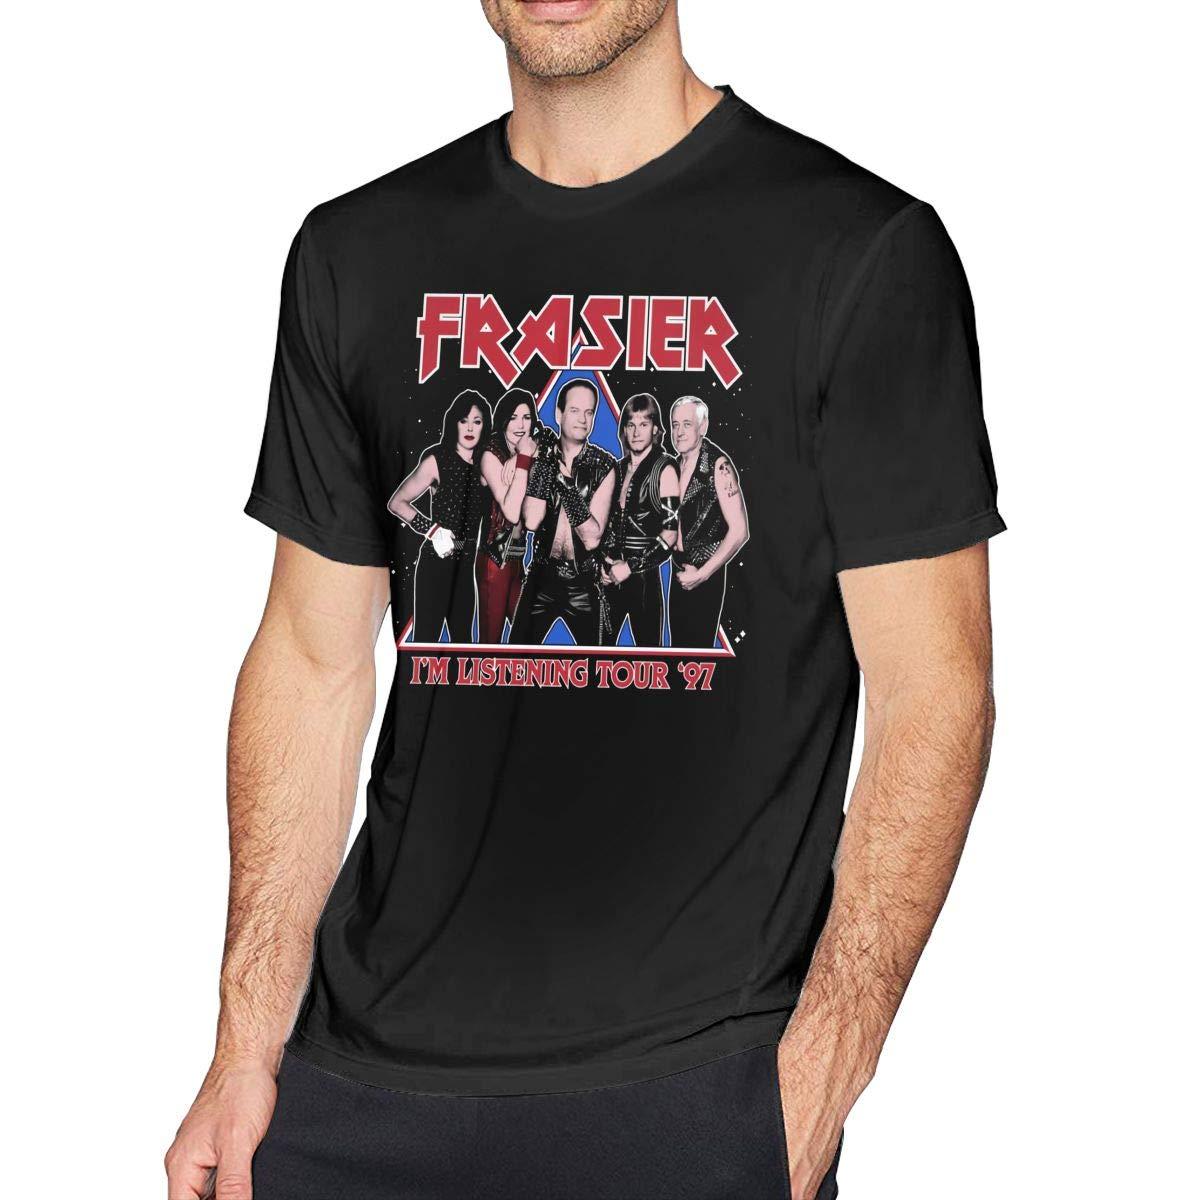 NeedLove Mens Vintage Frasier Im Listening Tour 97 Tees Black